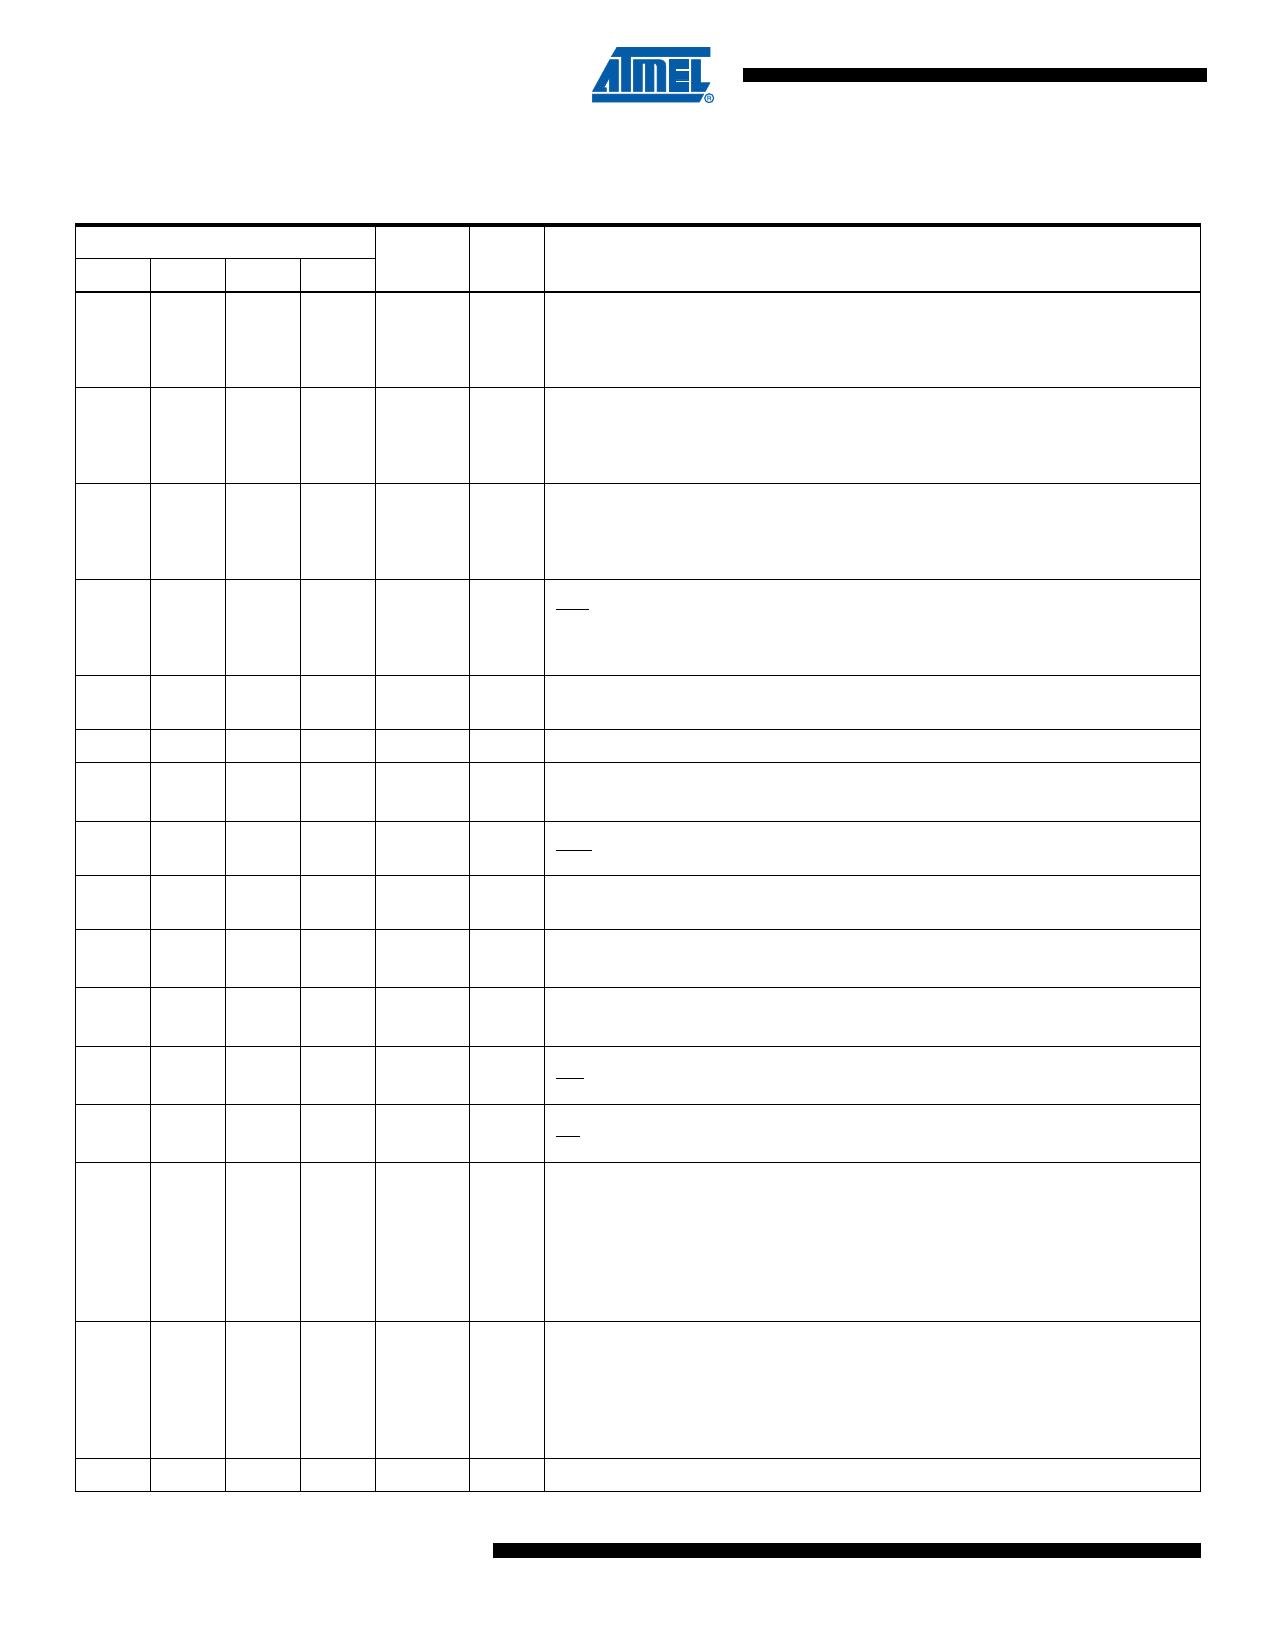 AT89LP3240 pdf, 반도체, 판매, 대치품